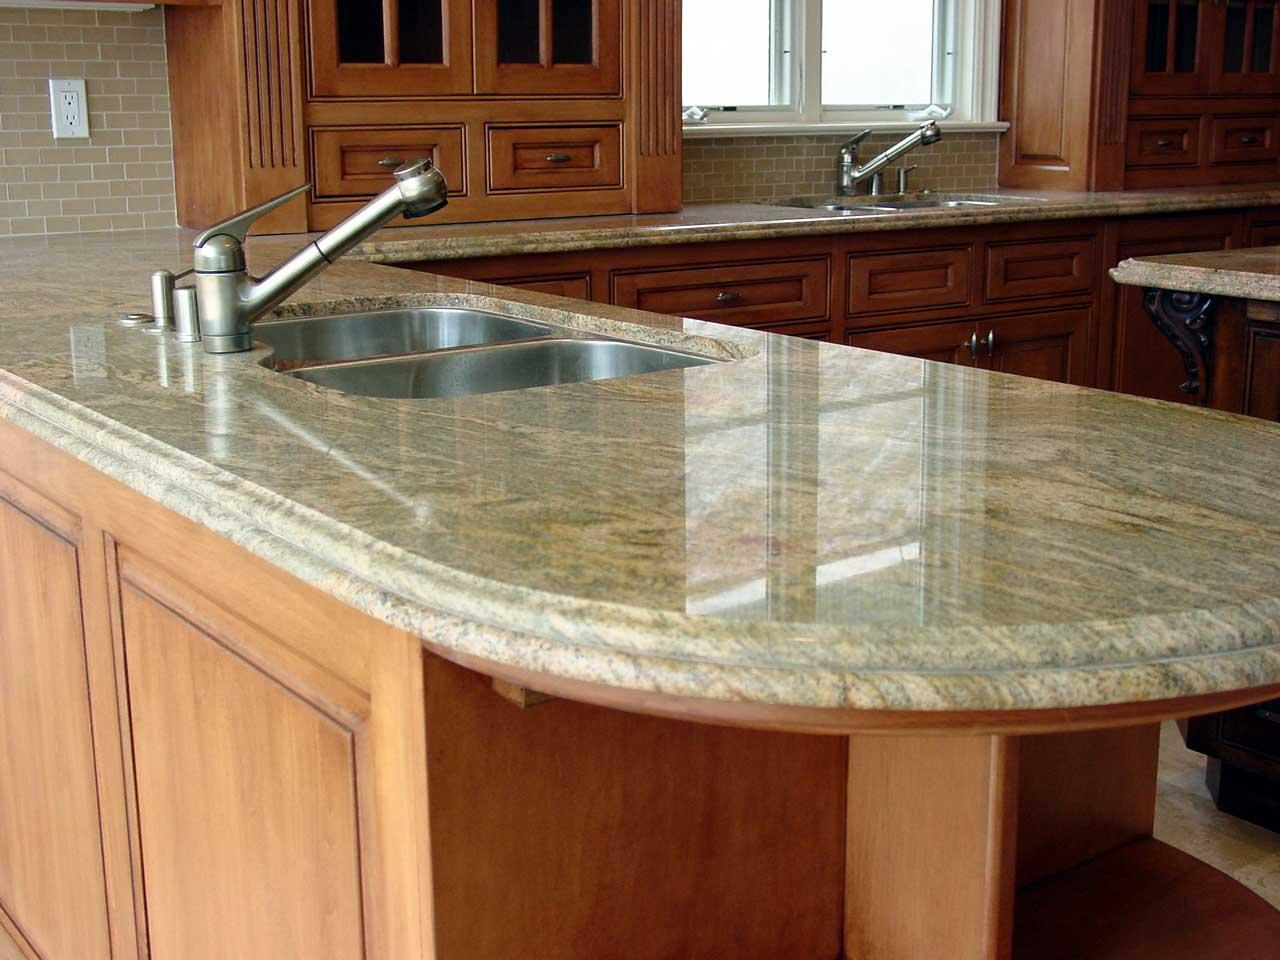 Kitchens westside tile and stone - Frosted glass backsplash ...